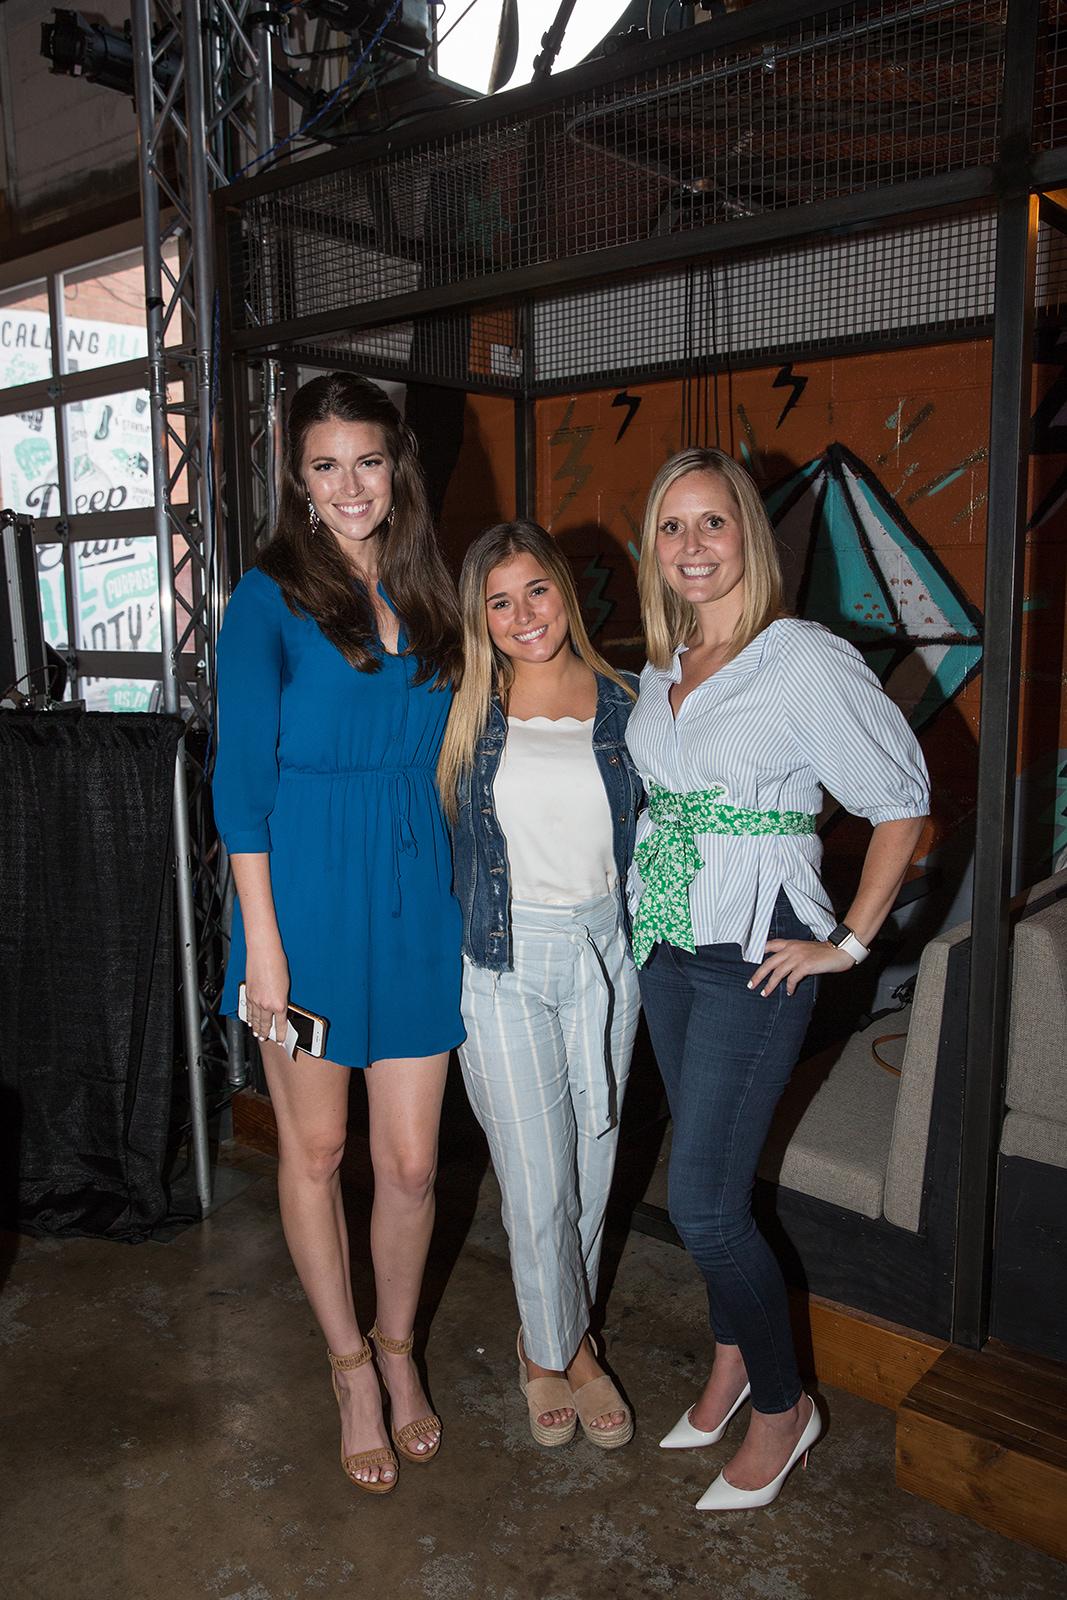 Lindsay Scott, Karsyn Carone, and Carla (last name).jpg